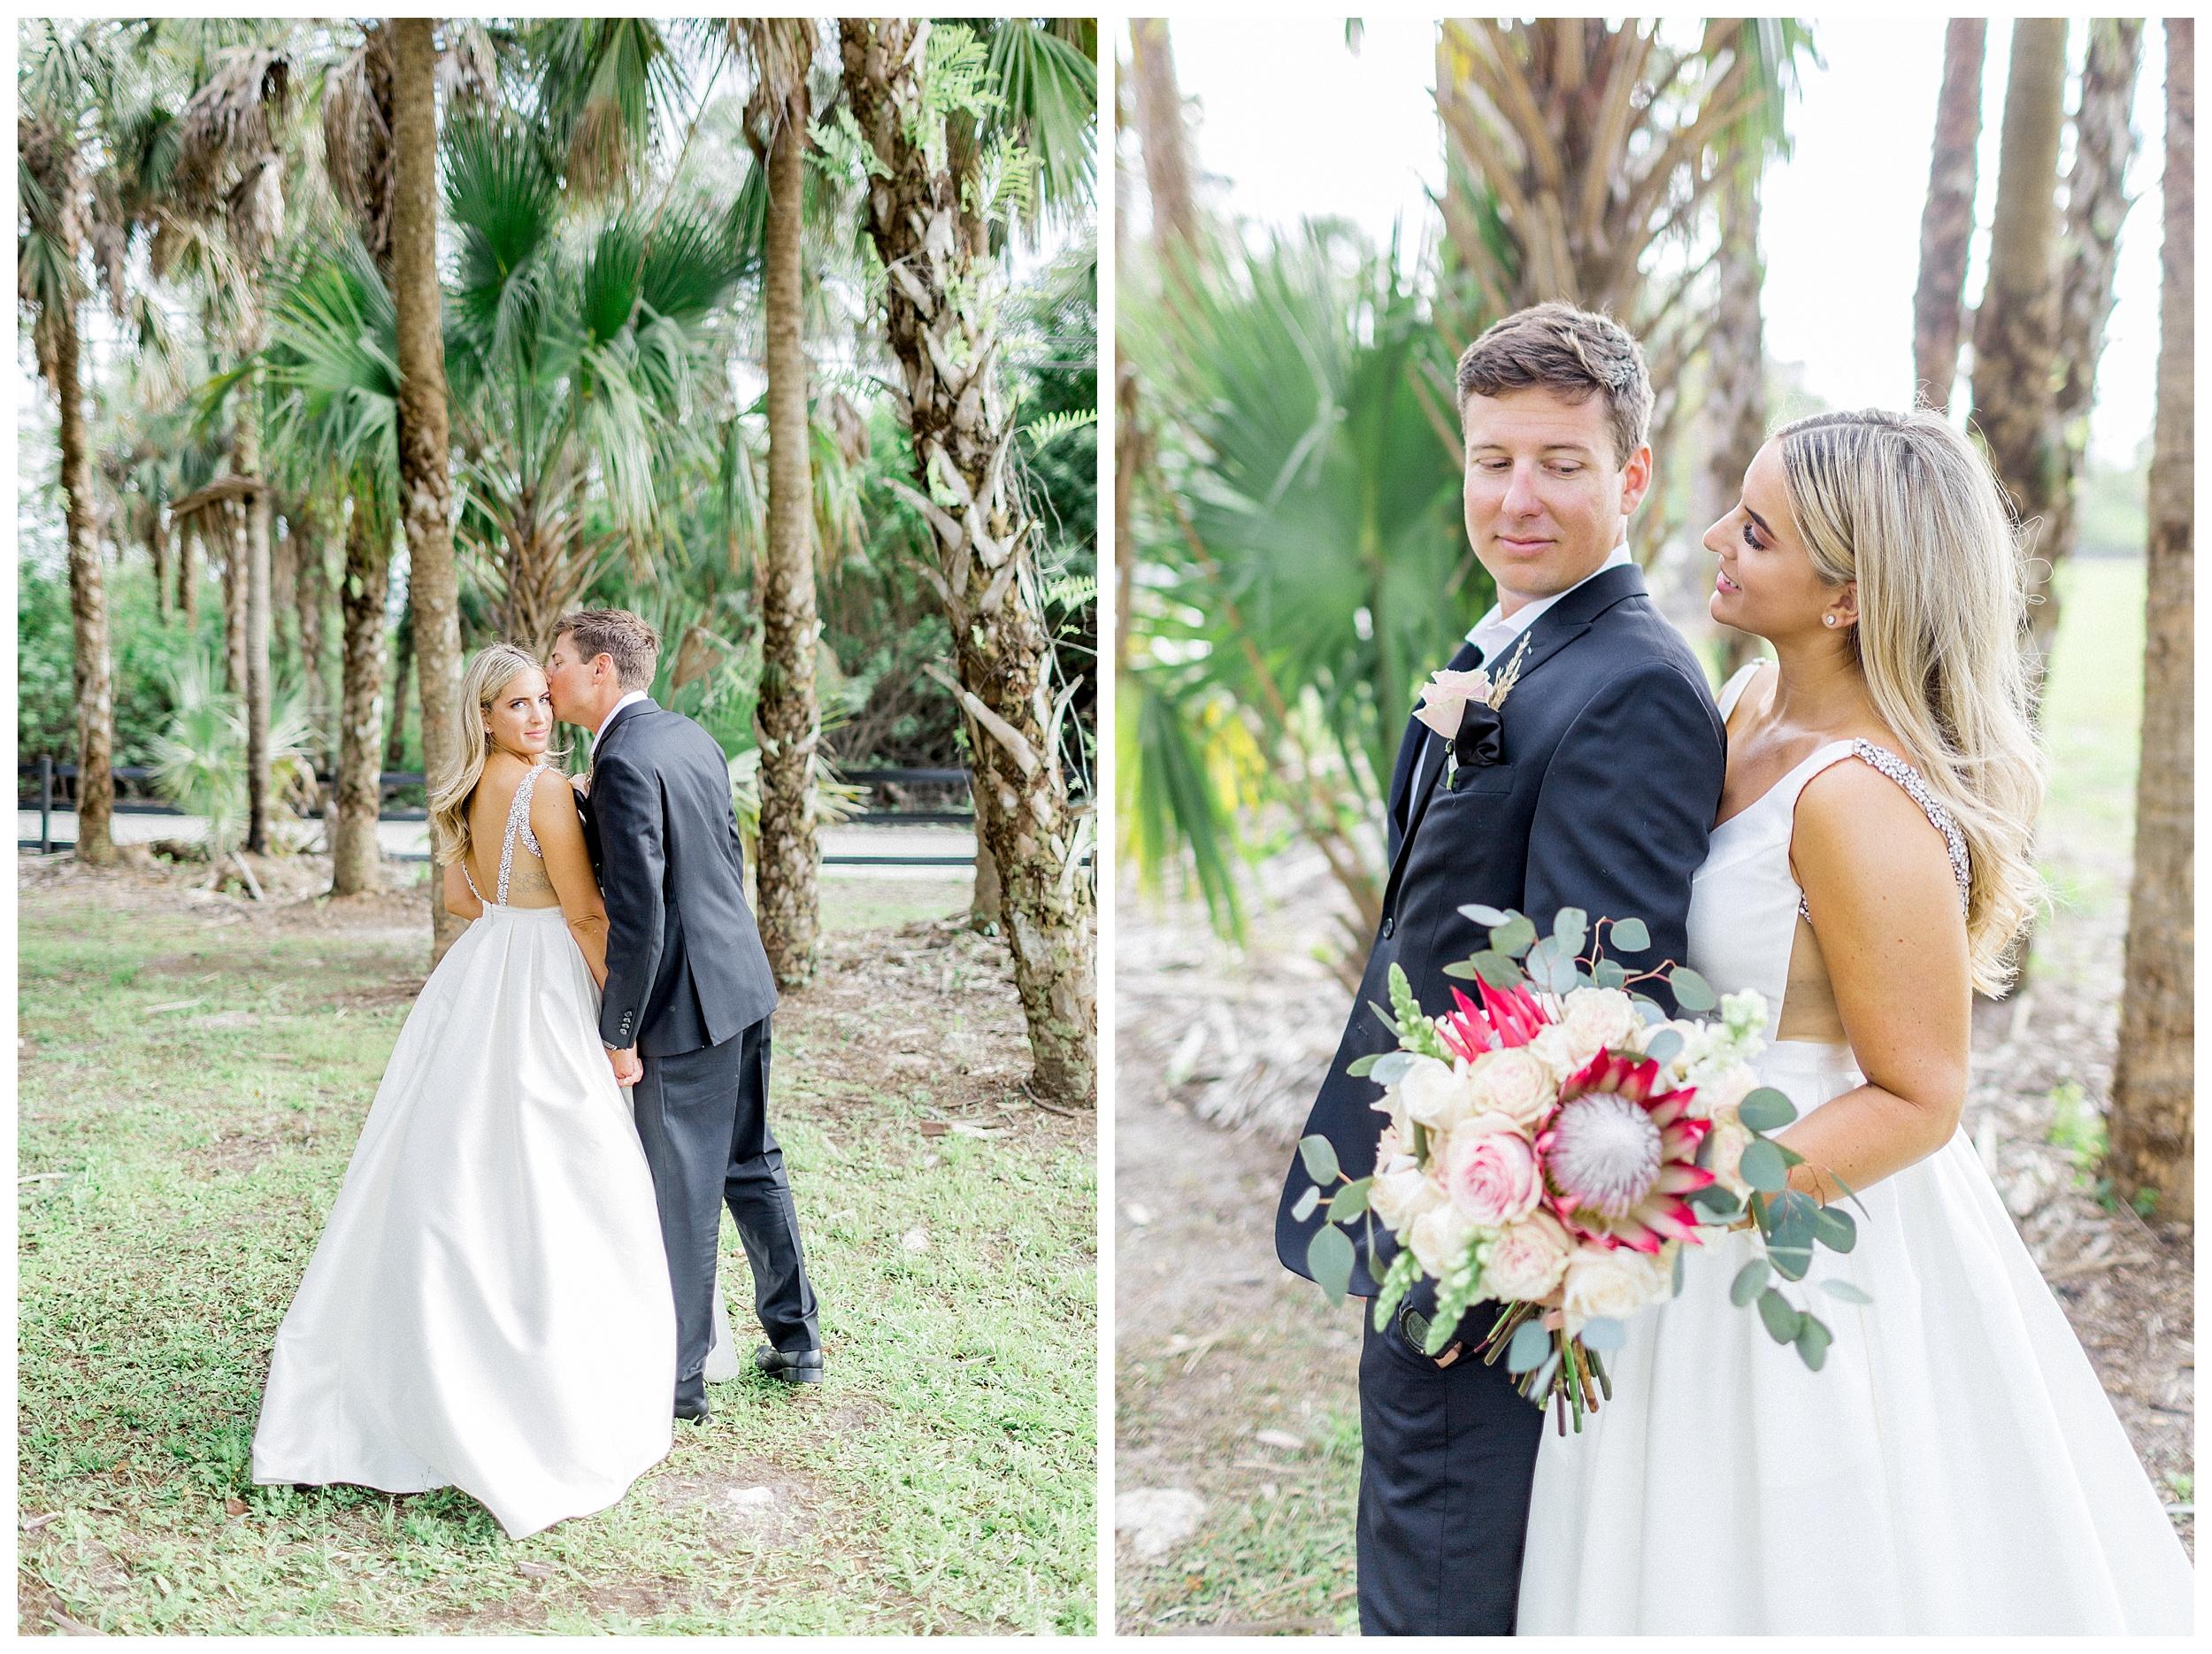 South Florida Wedding Photographer Kir Tuben_0045.jpg